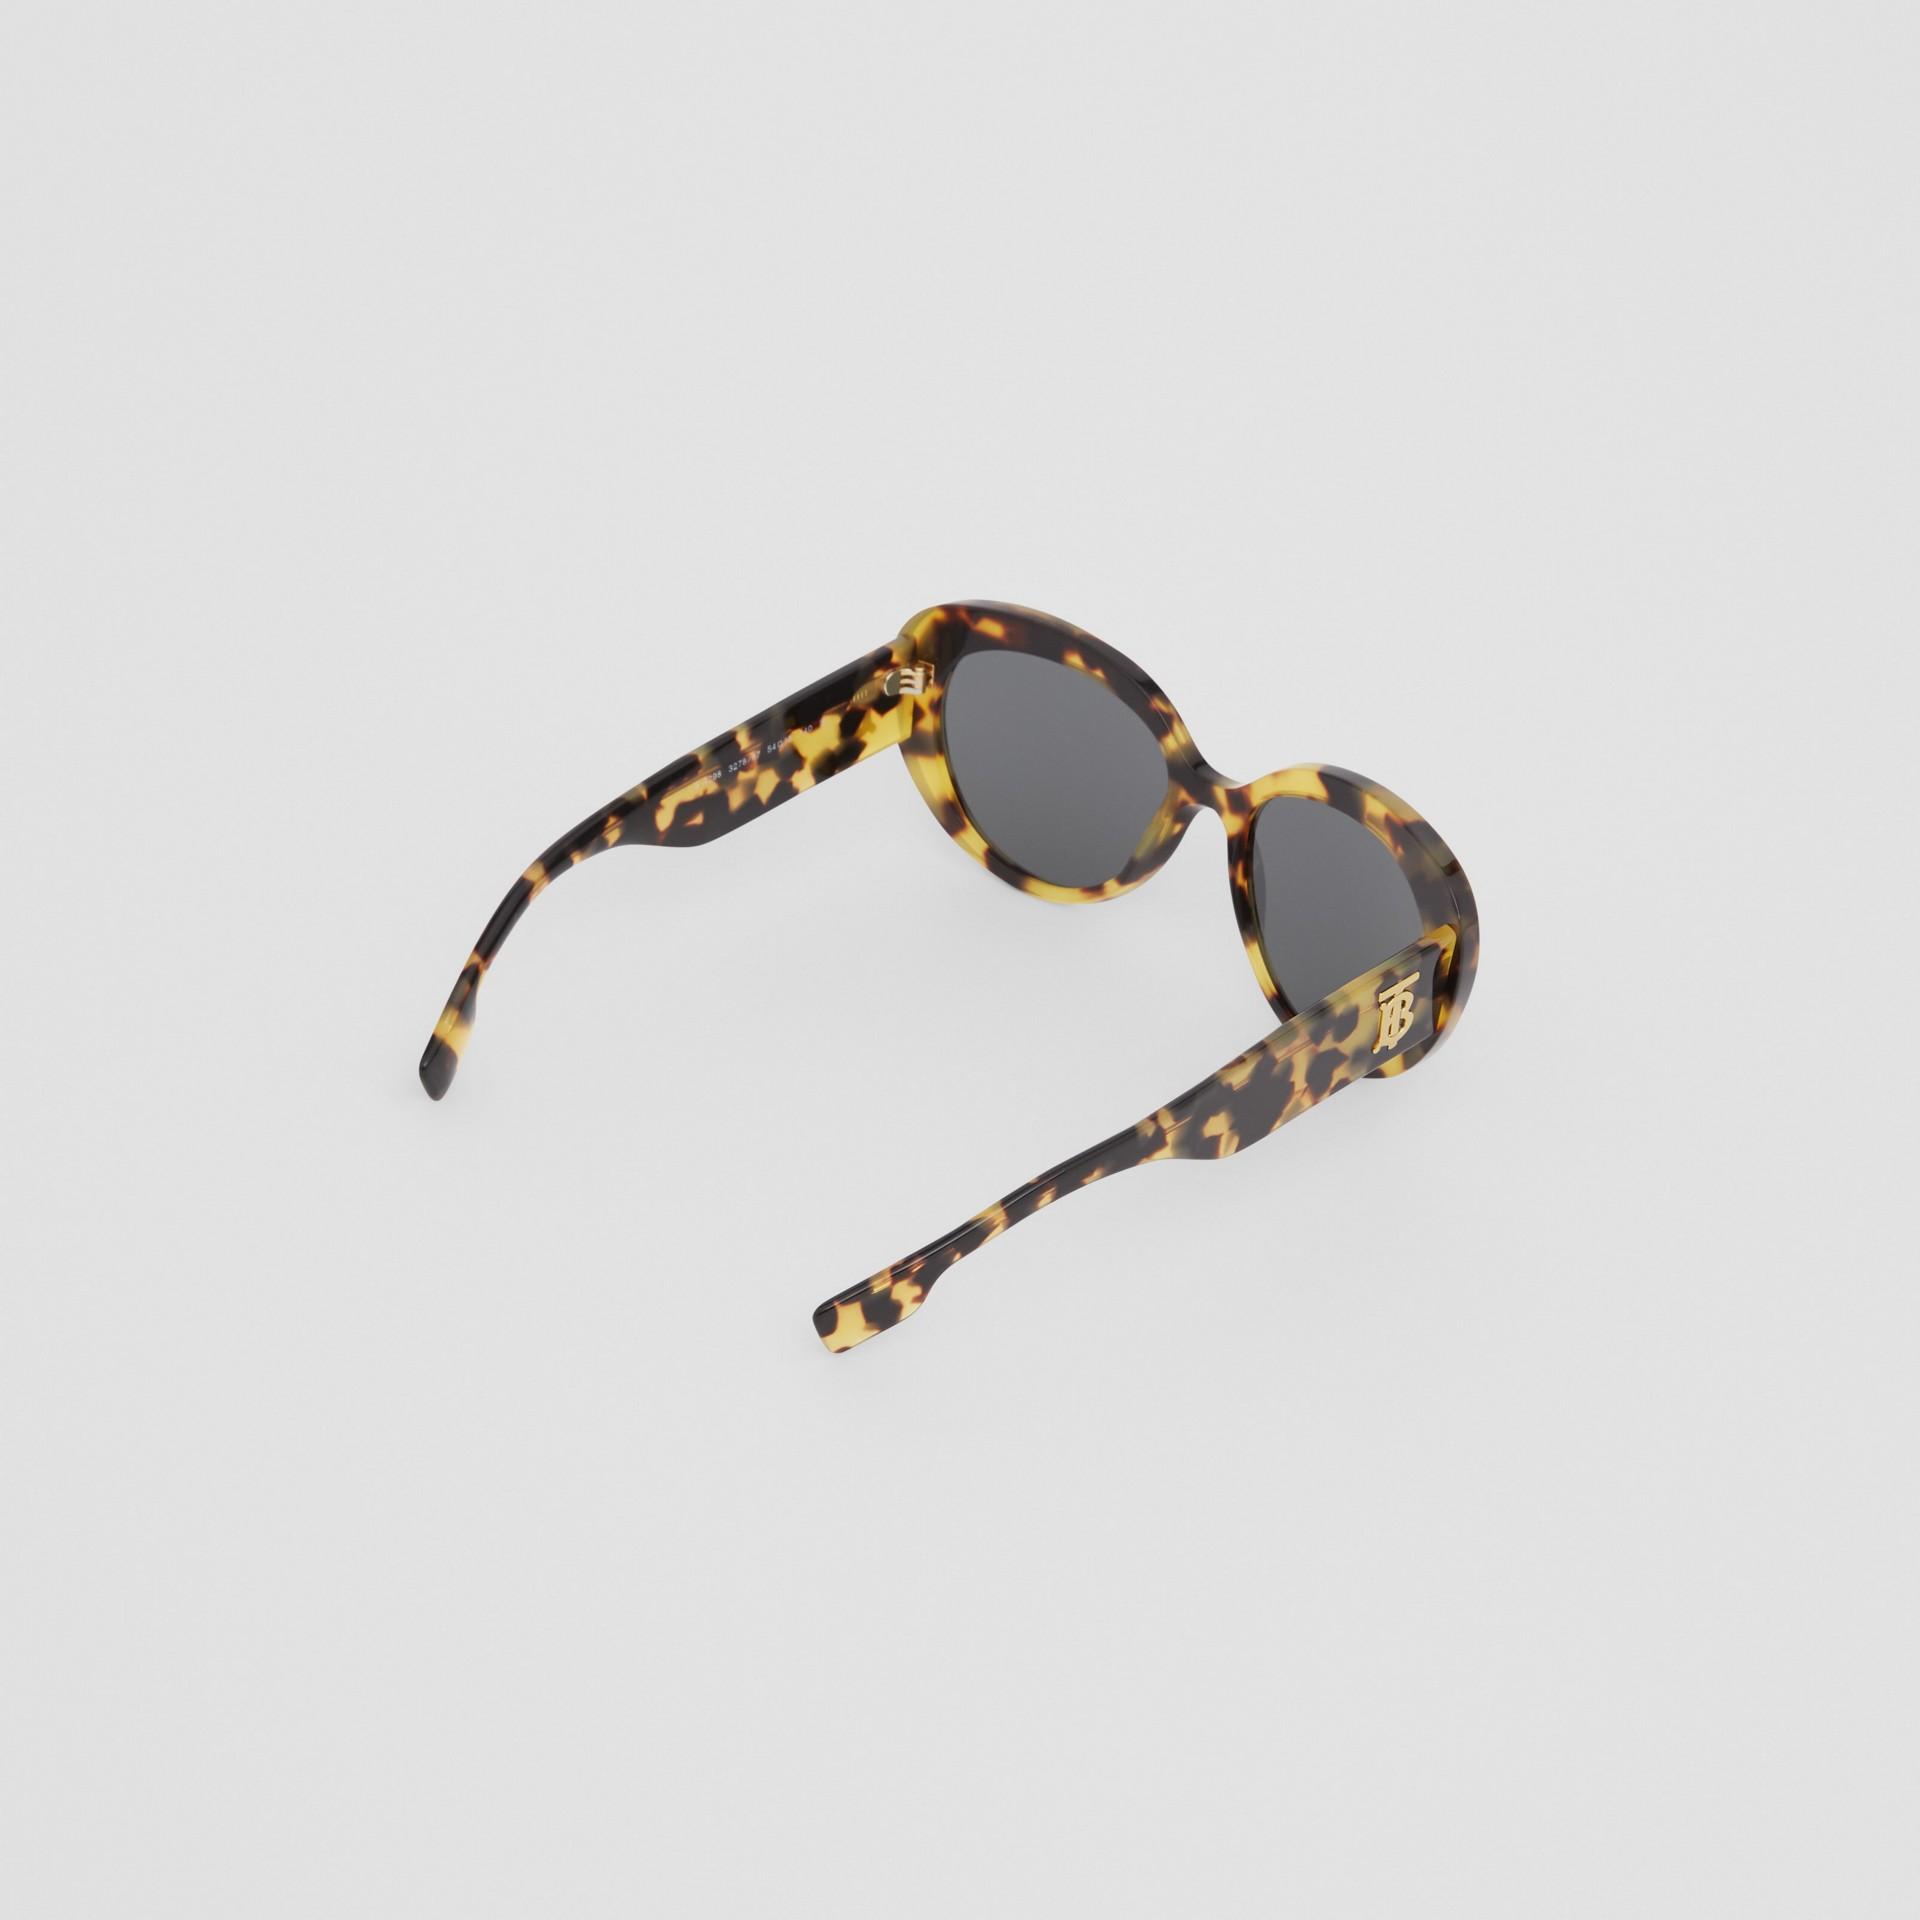 Monogram Motif Cat-eye Frame Sunglasses in Bright Tortoiseshell - Women | Burberry United Kingdom - gallery image 4